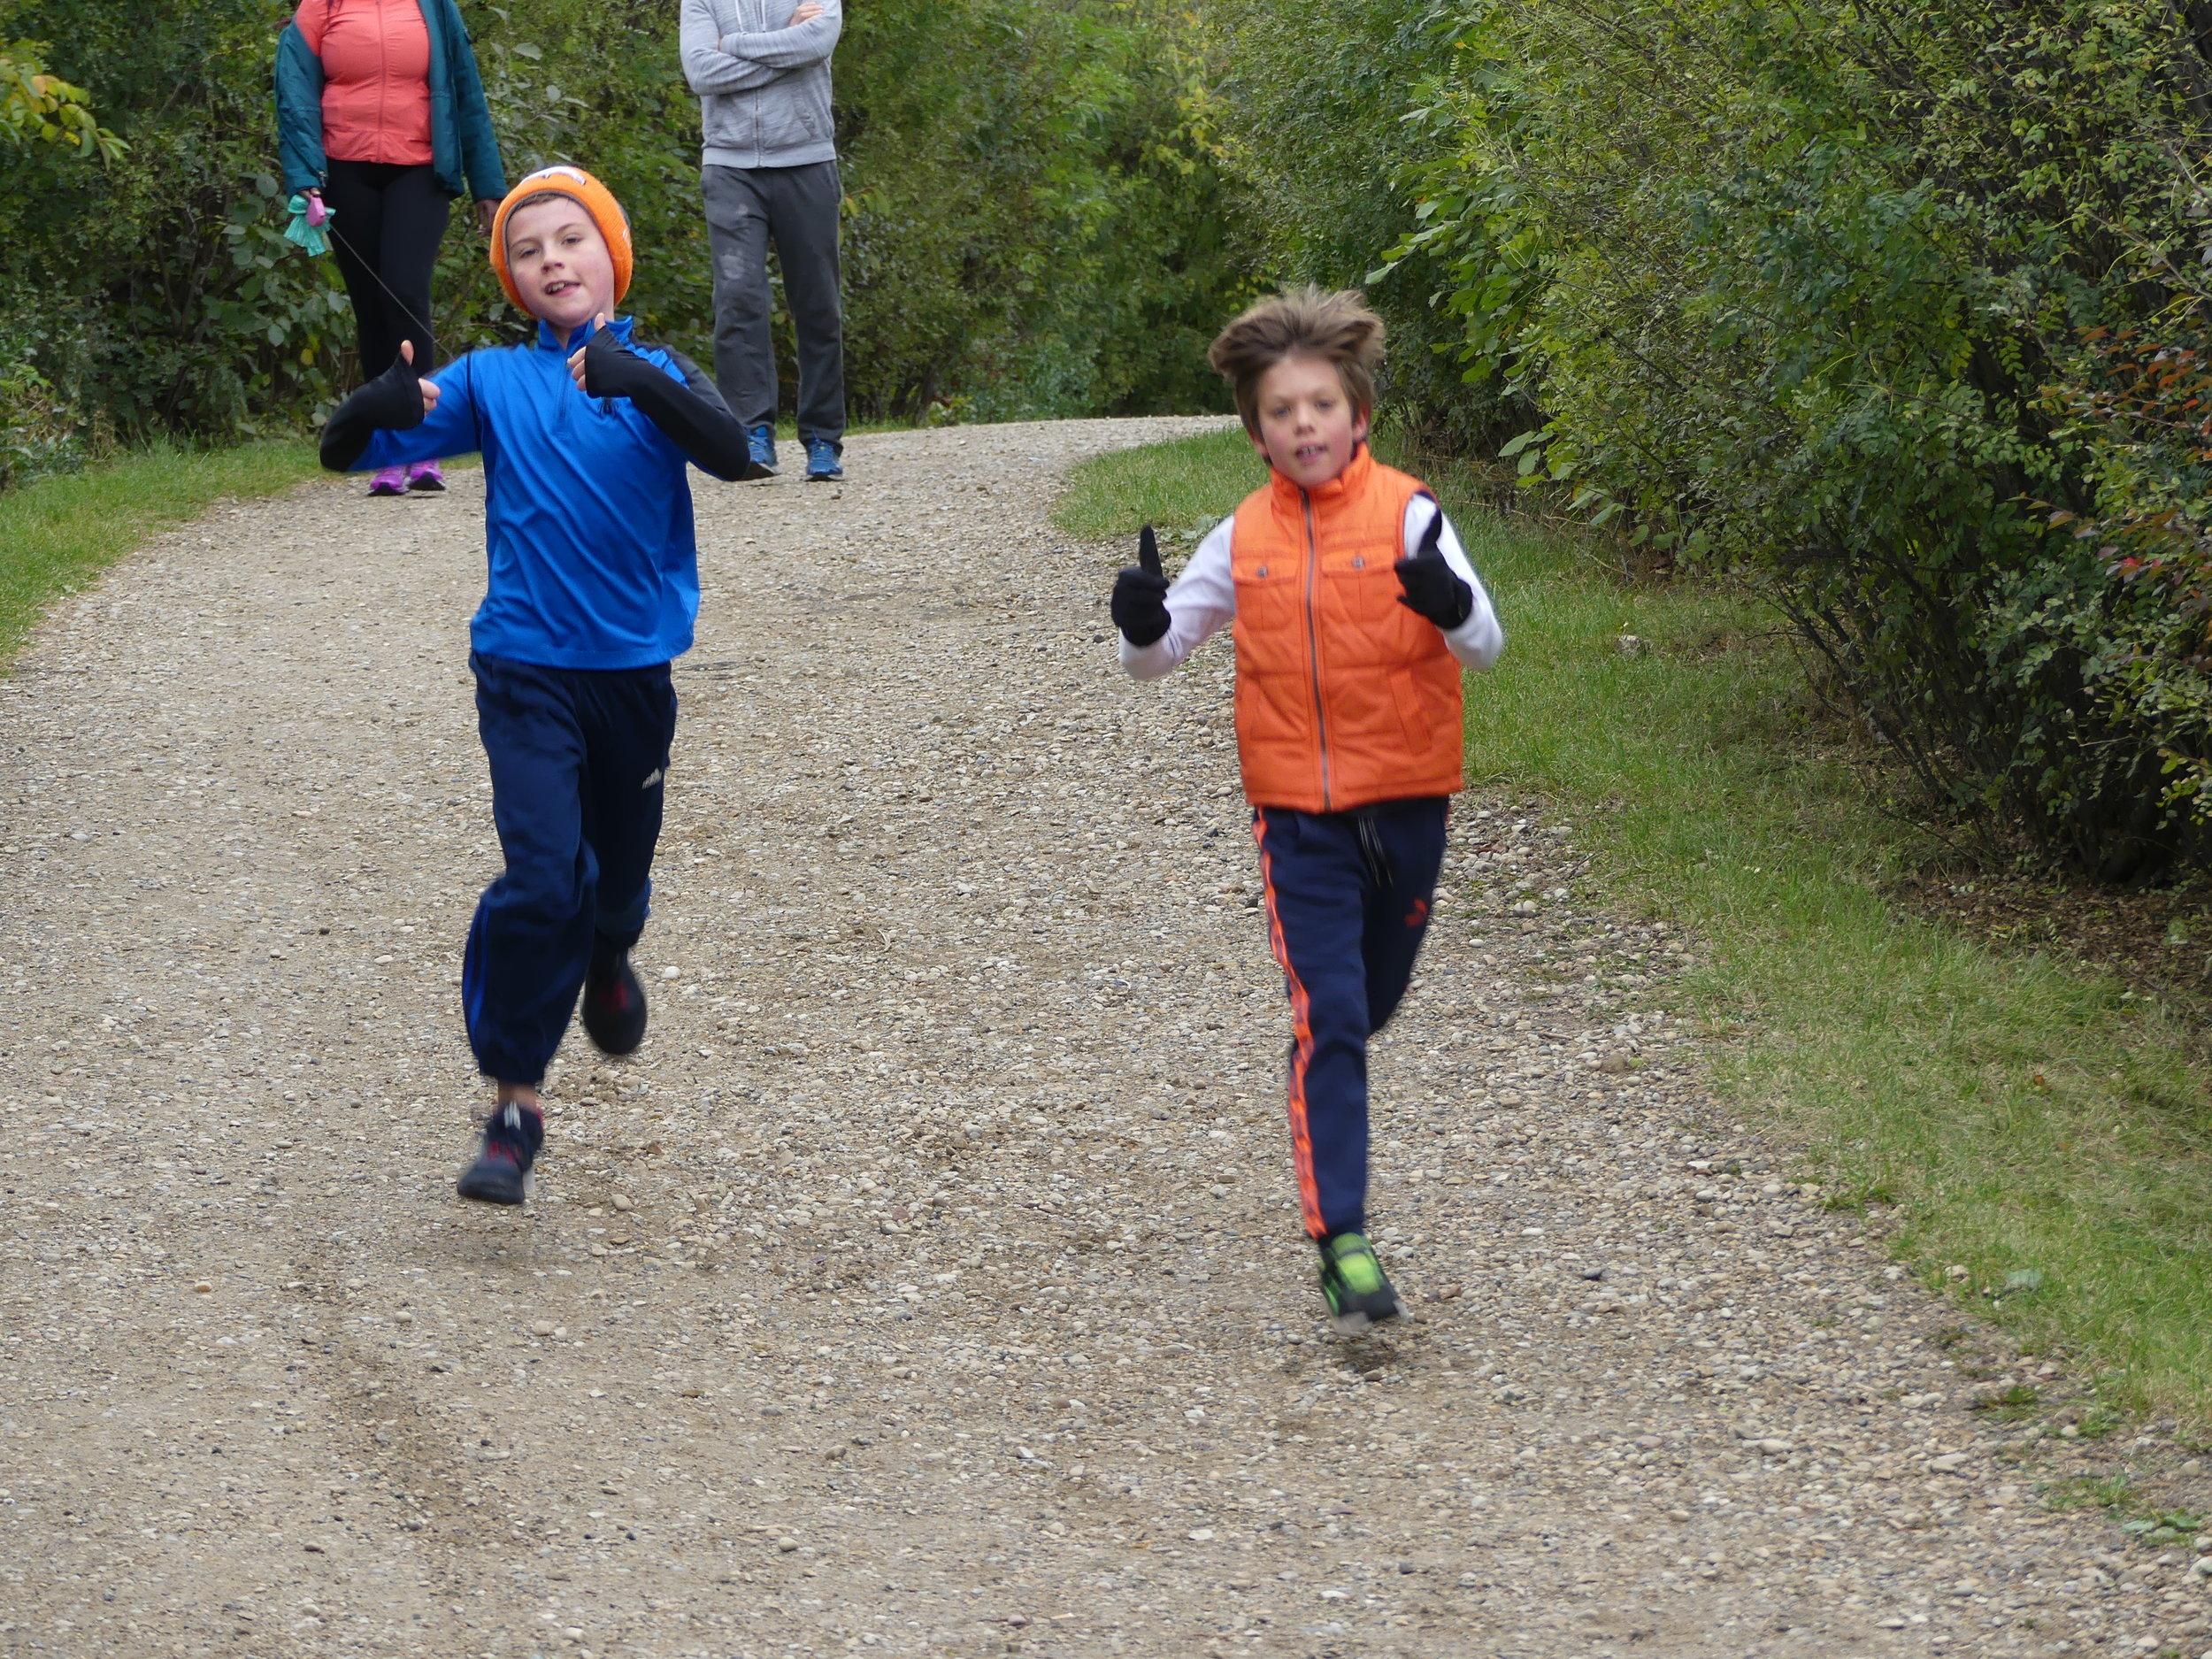 Logan and Joseph running for their Grandpa.